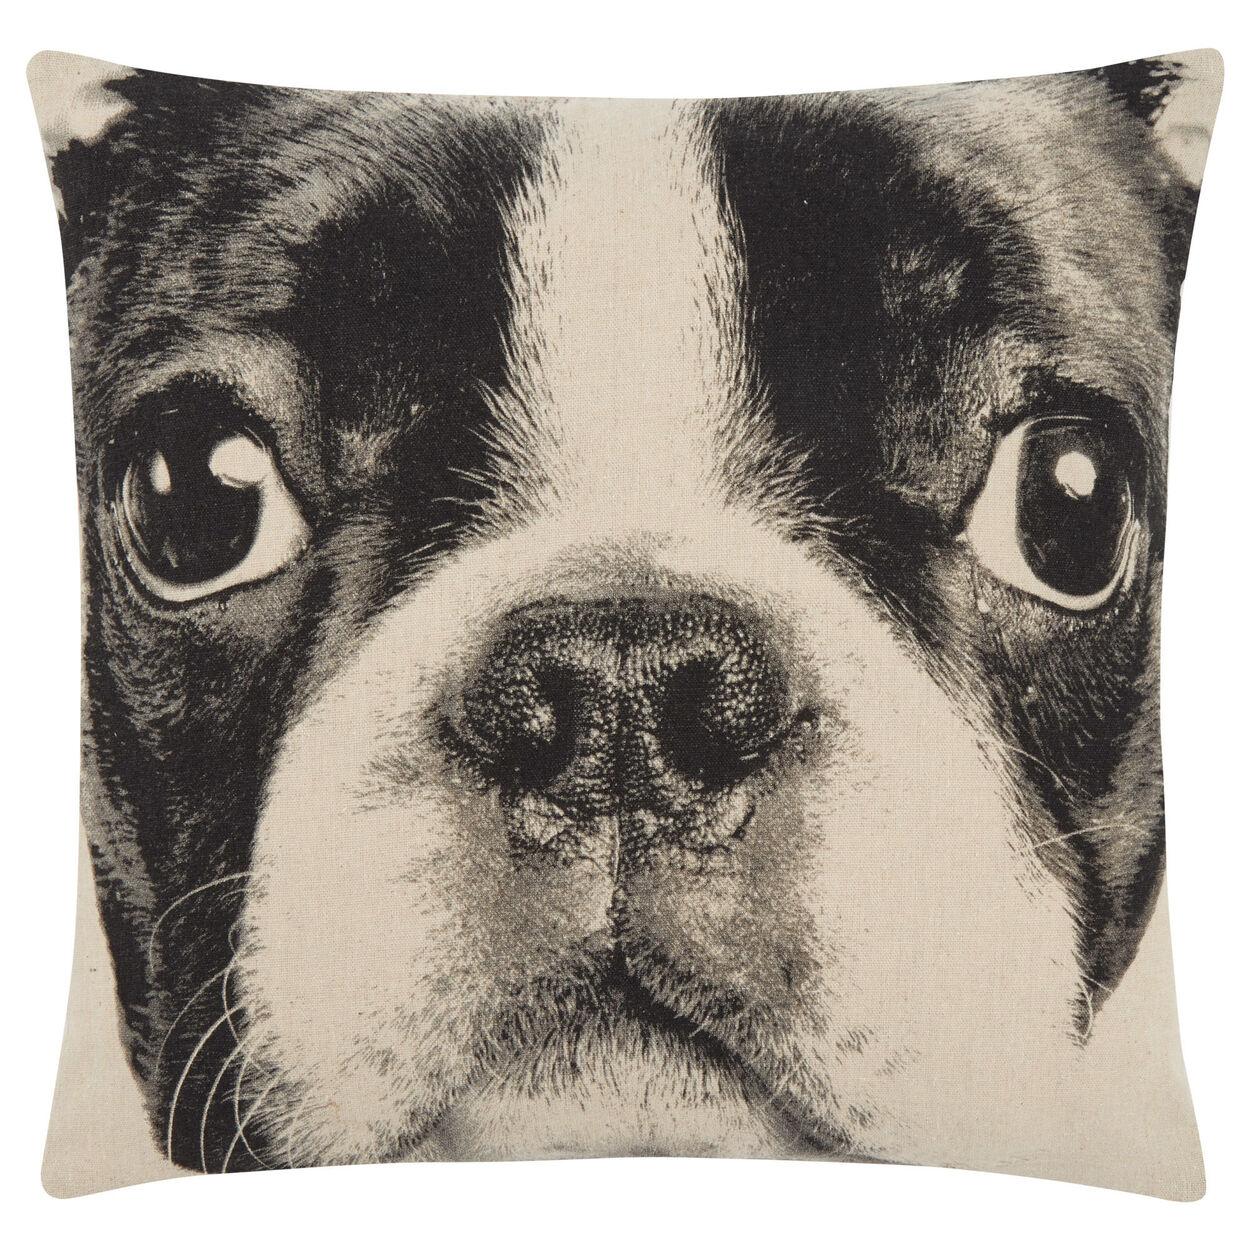 "Frank Decorative Pillow Cover 18"" X 18"""